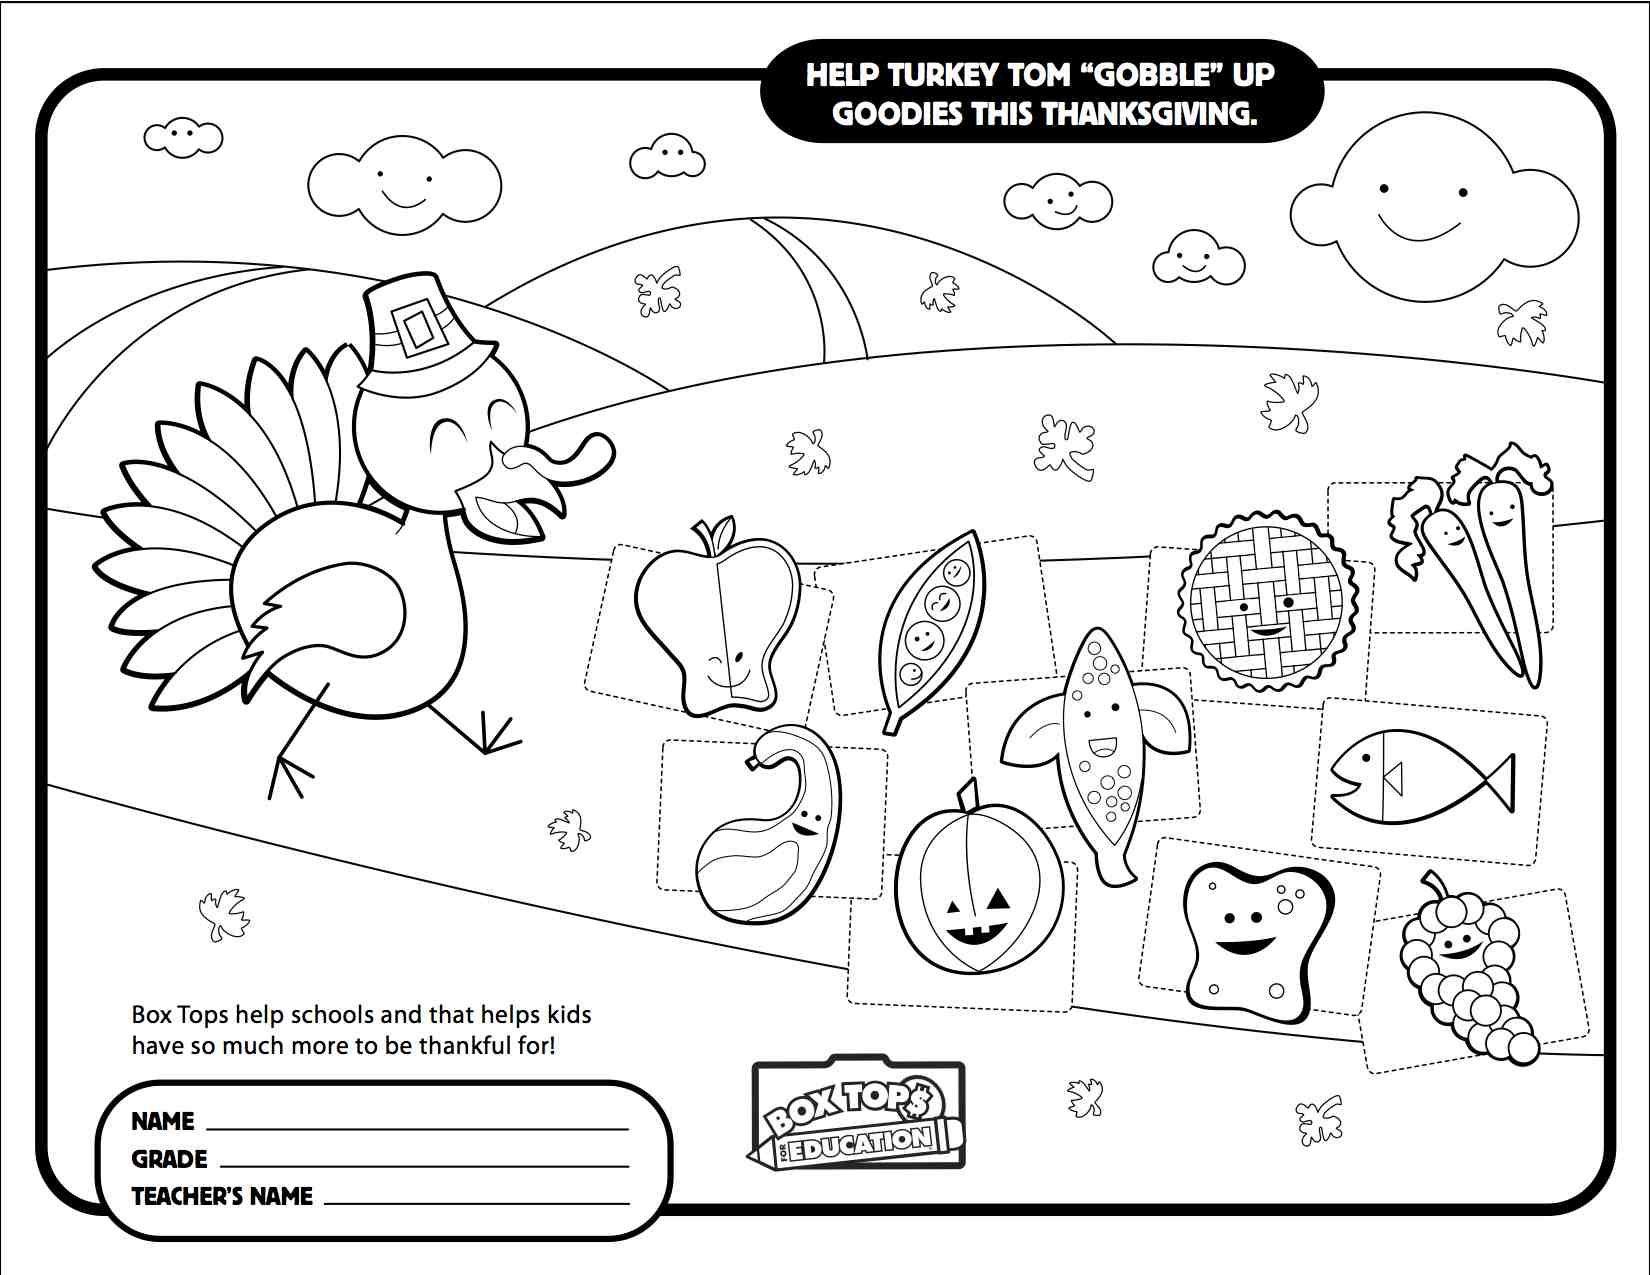 Turkey Collection Sheet